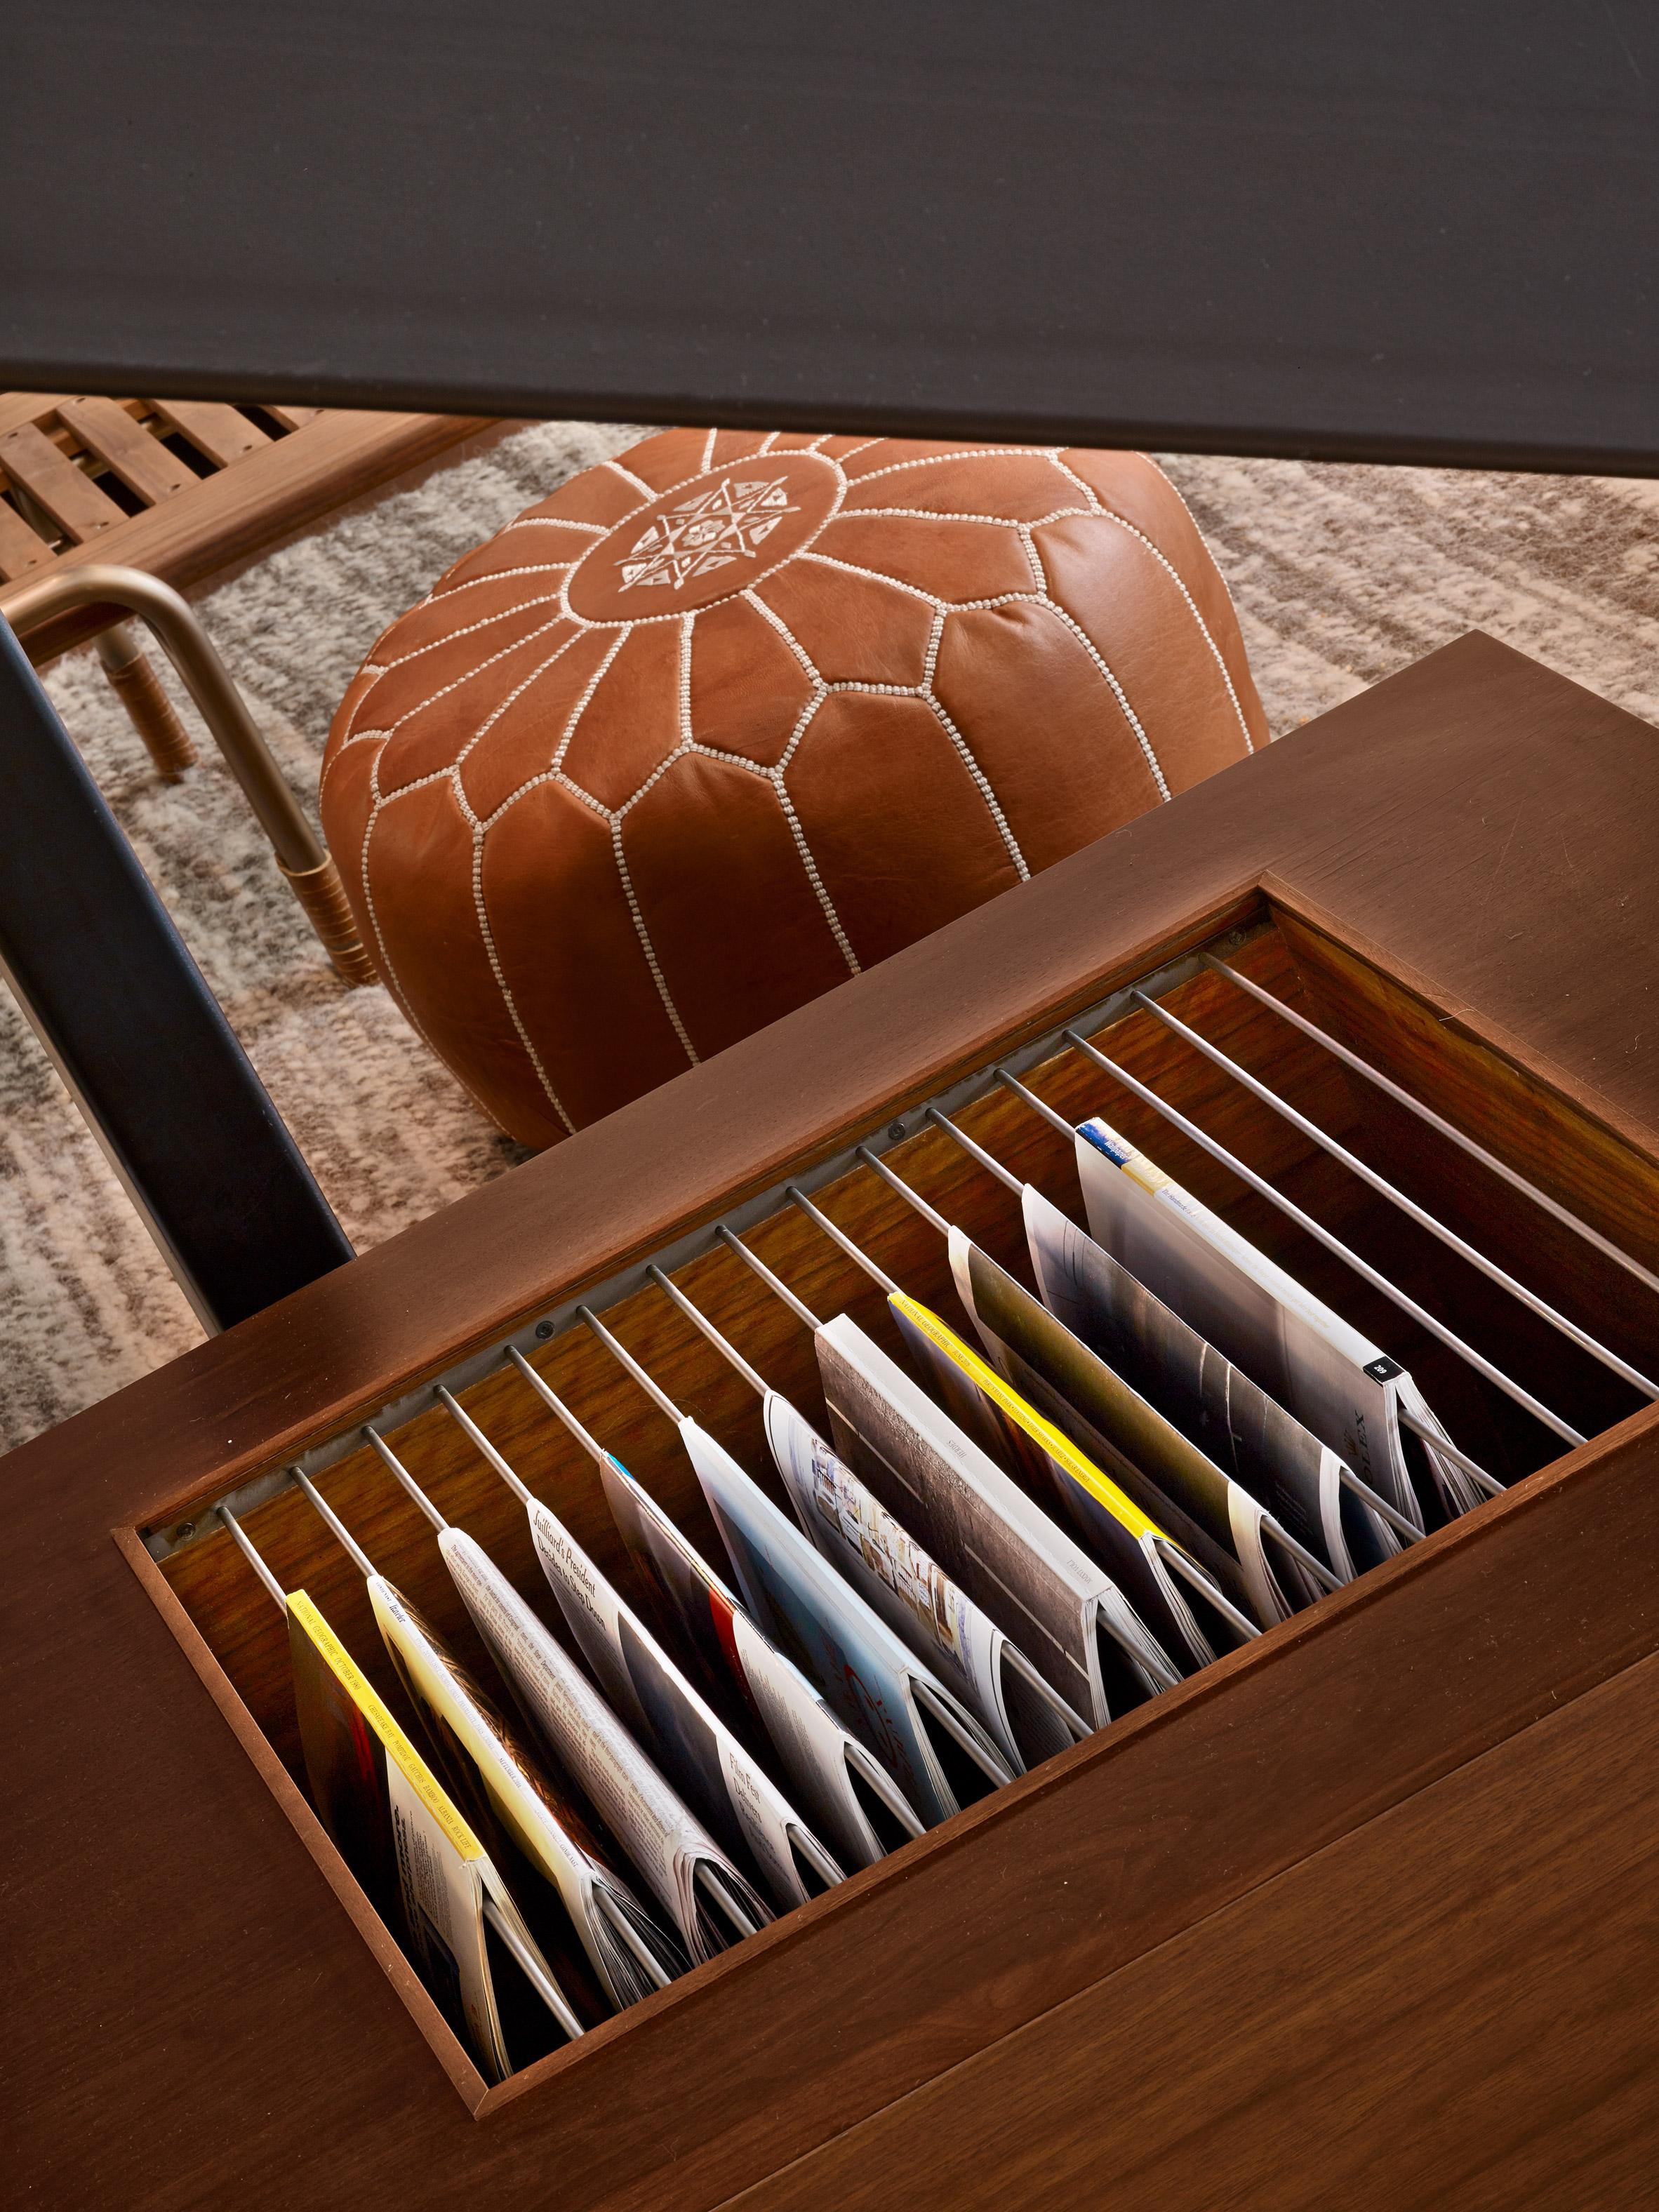 architecture-new-york-city-micro-hotel-design-studia-interiors-osnovadesign-osnova-poltava_24